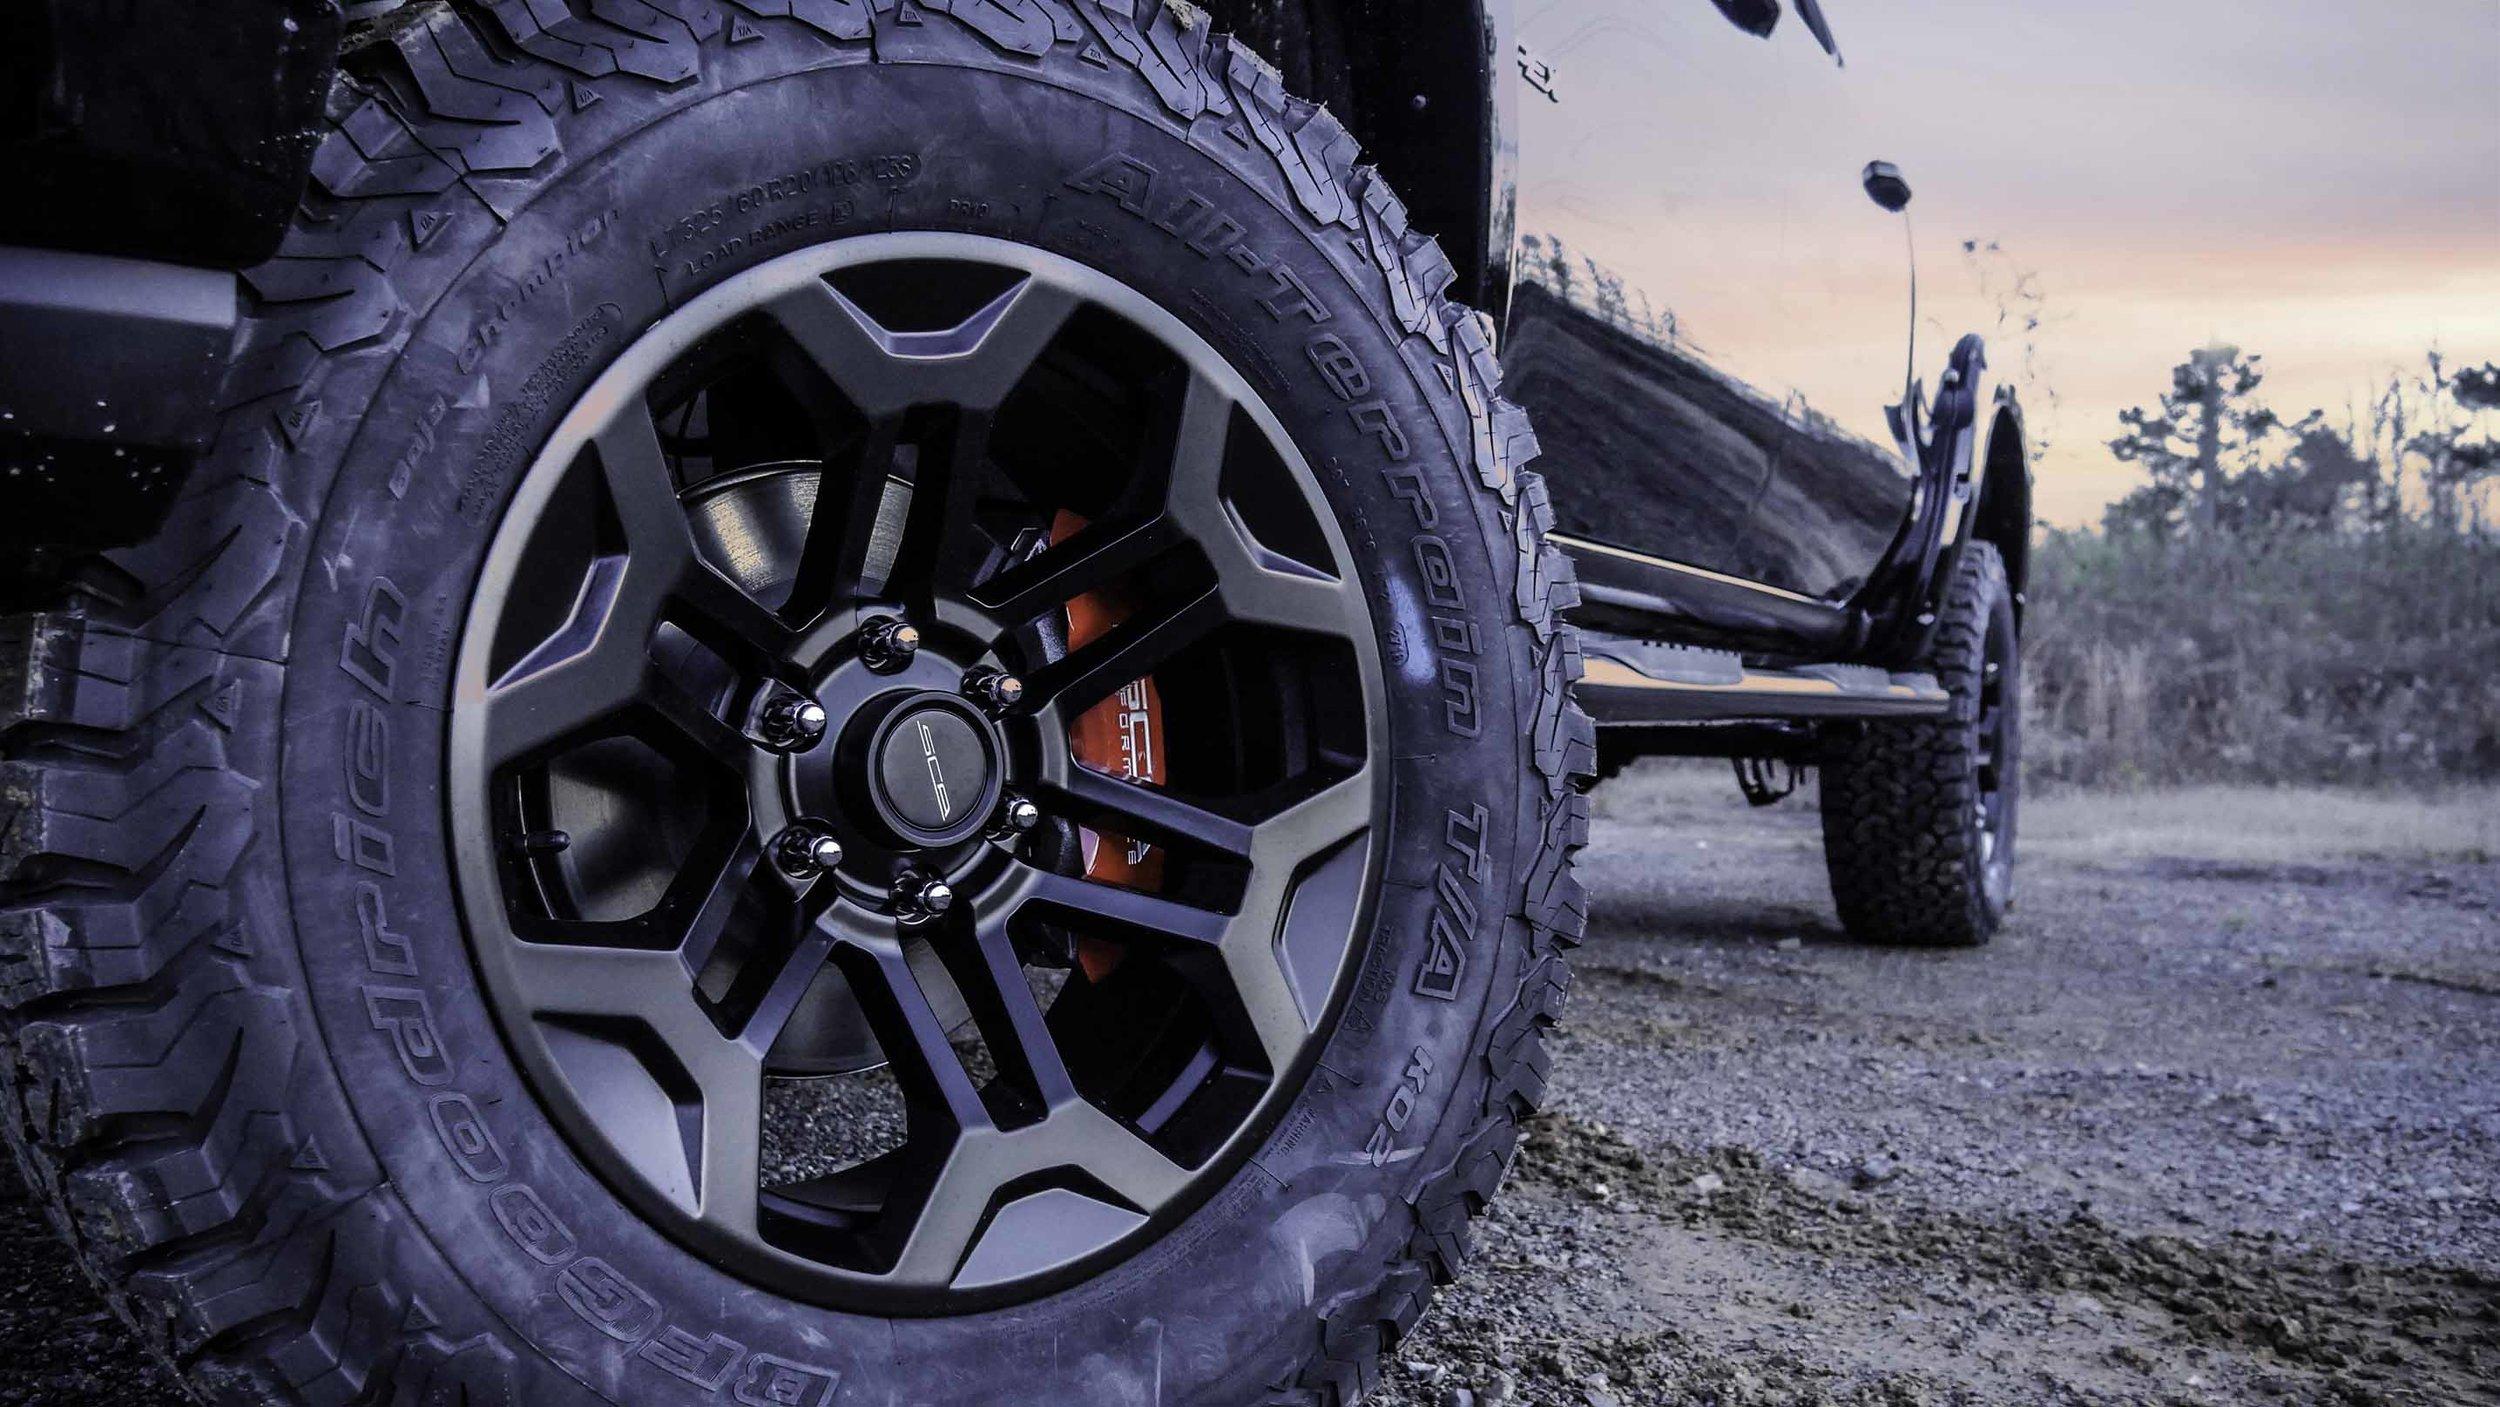 2019 Chevy Apex Matte Black Wheel.jpg